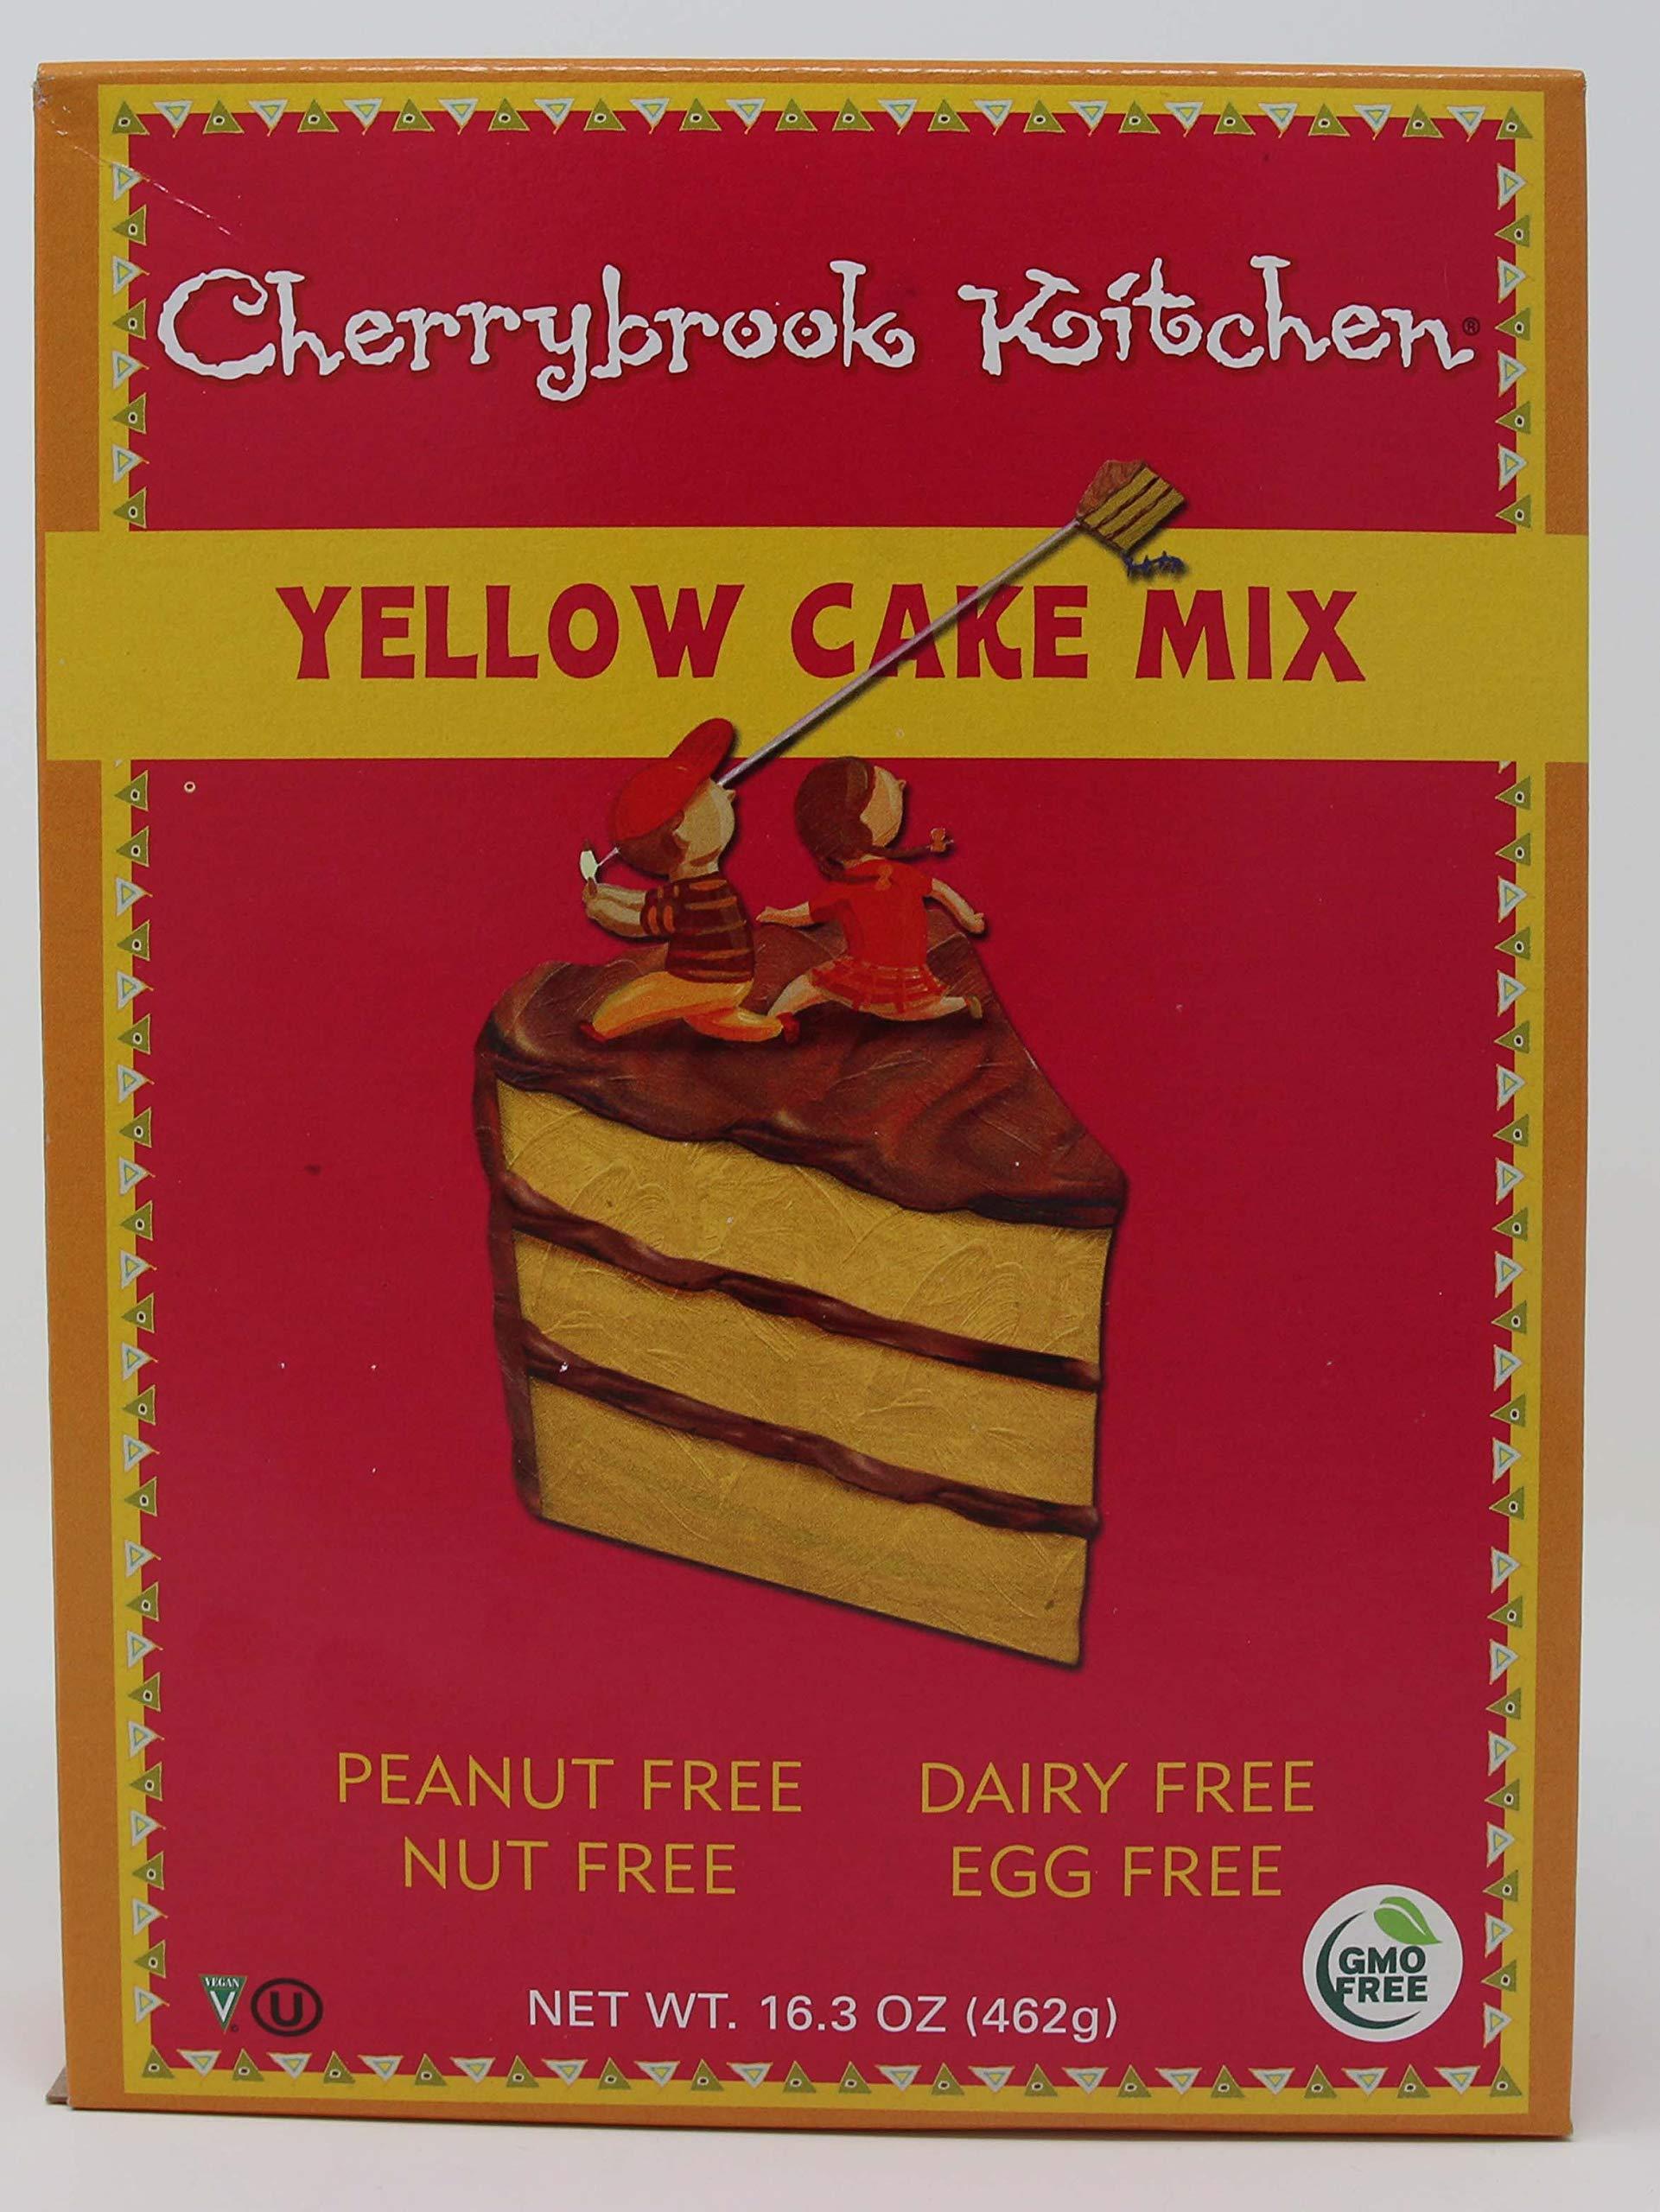 Cherrybrook Kitchen Yellow Cake Mix, 16.3-Ounce Box (Pack of 6) by Cherrybrook Kitchen